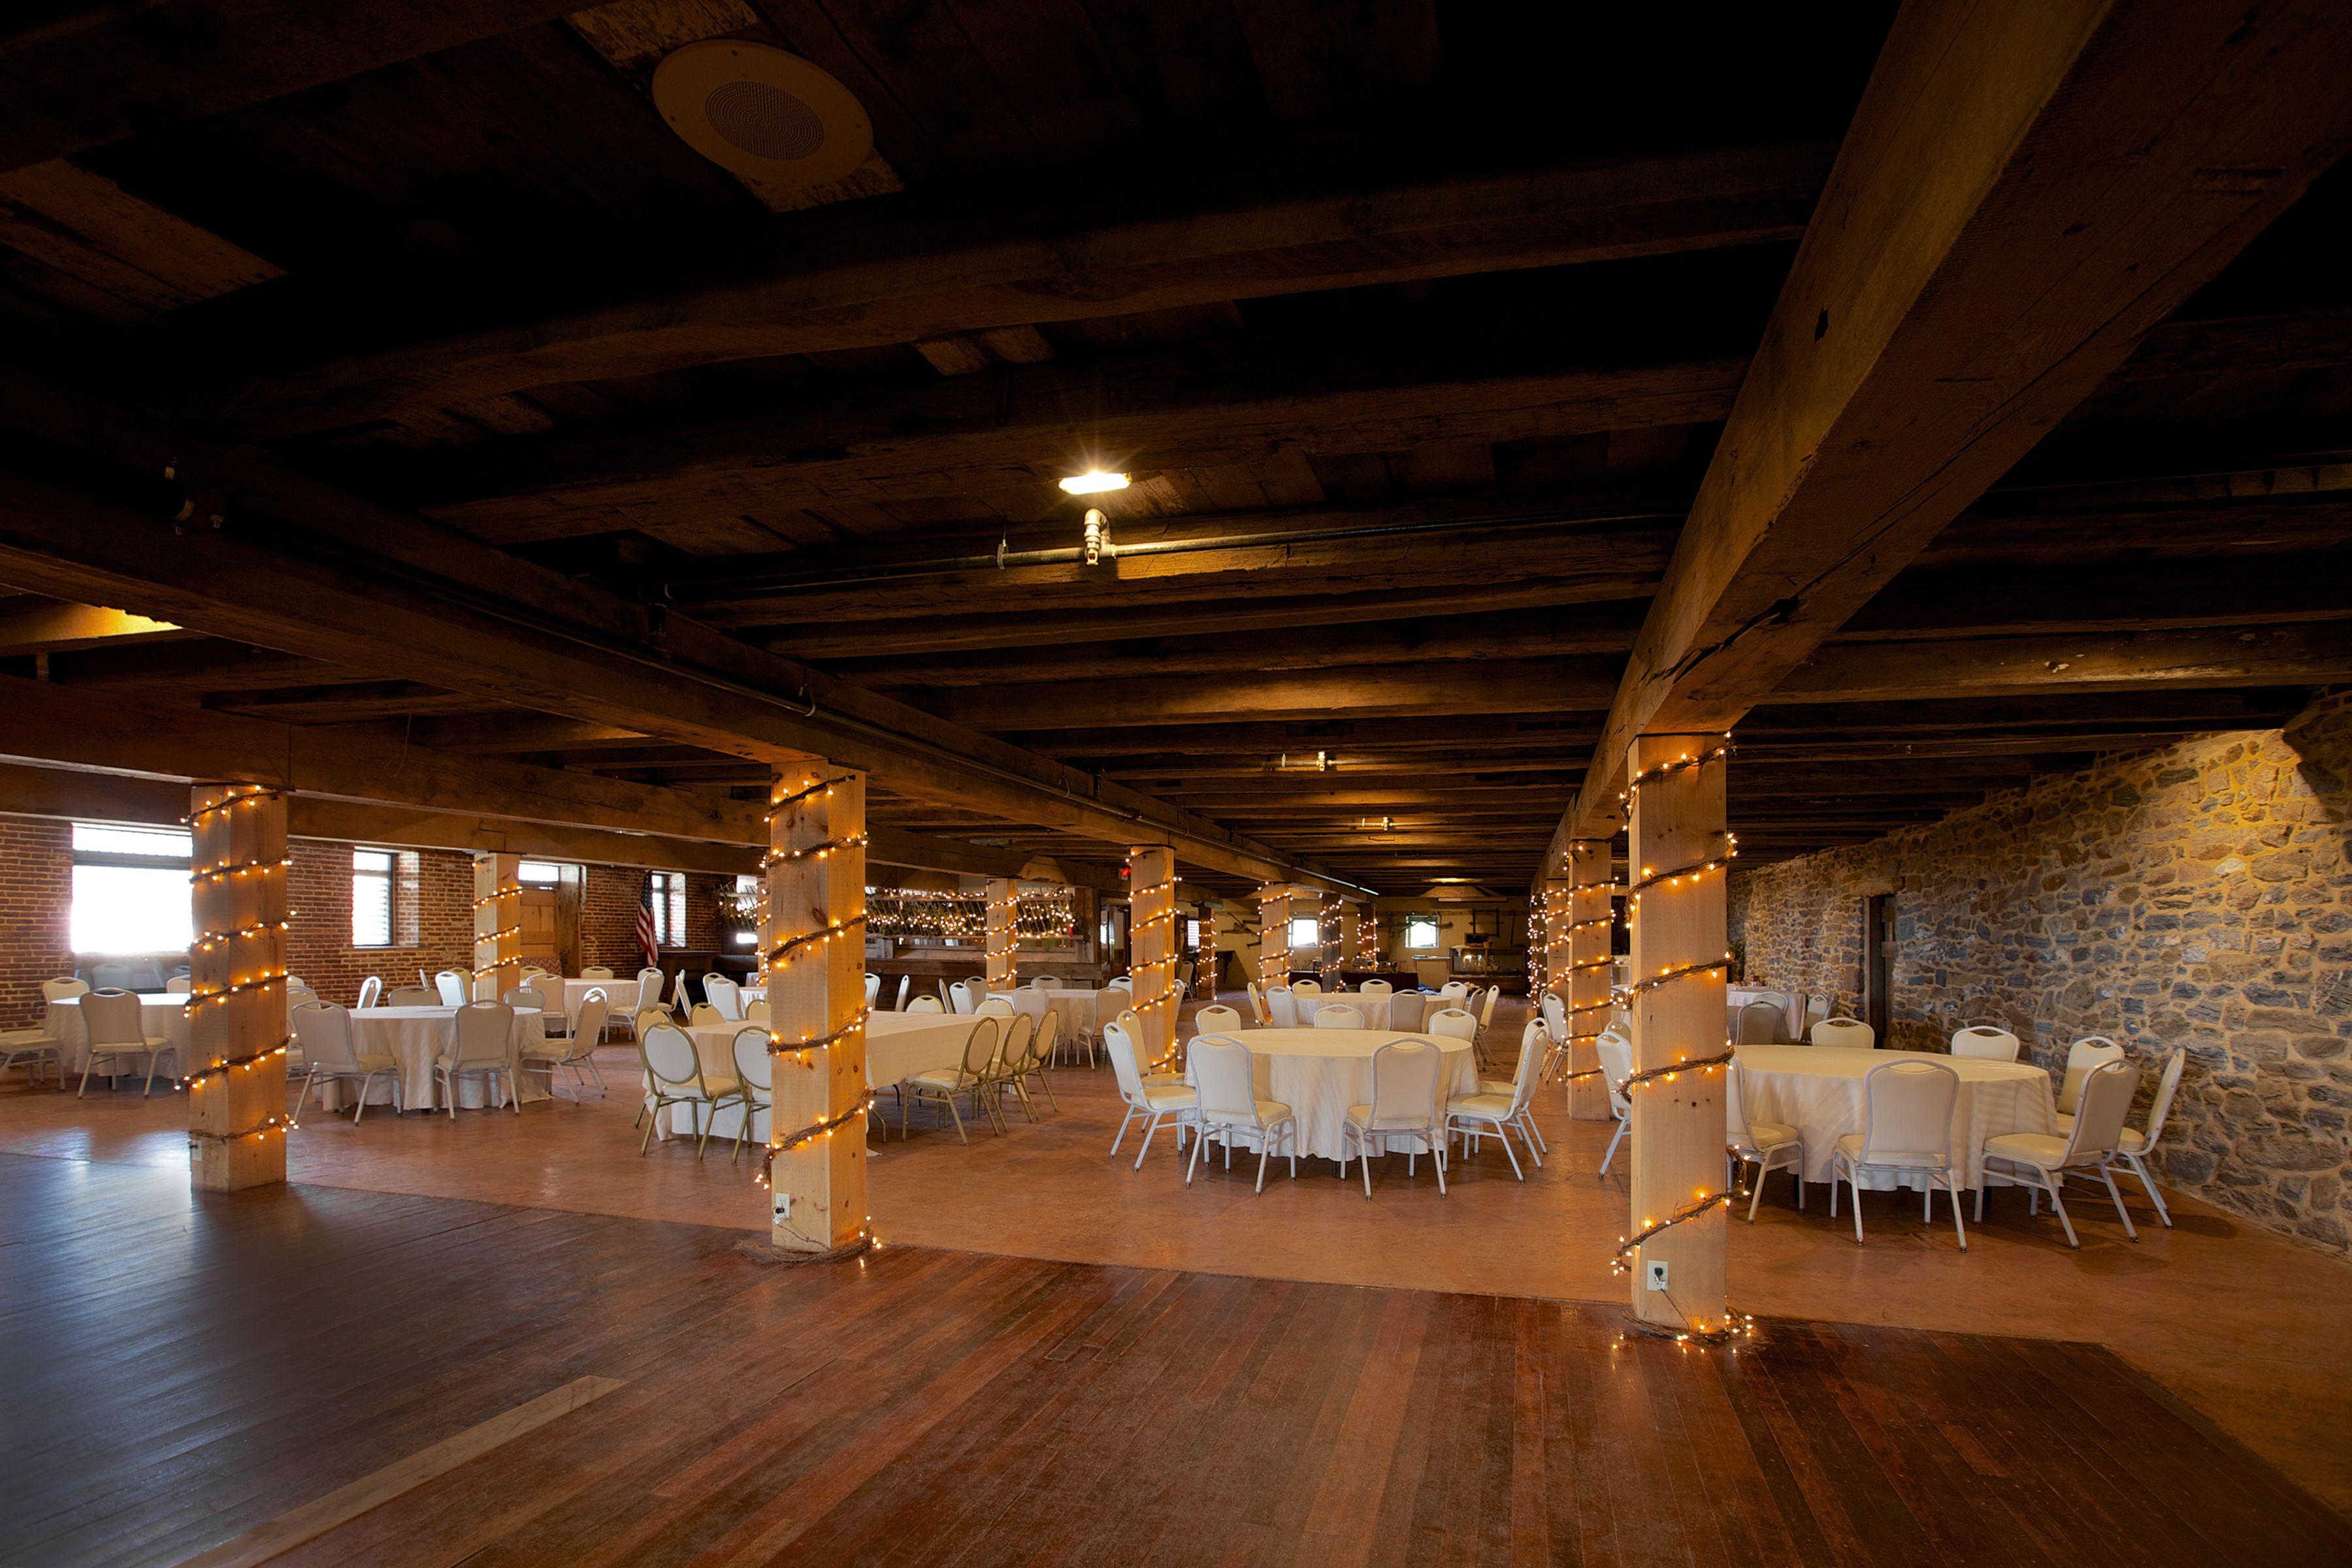 Rustic Barns In Lncaster County Pennsylvania Bride Barn Wedding Venues Farm